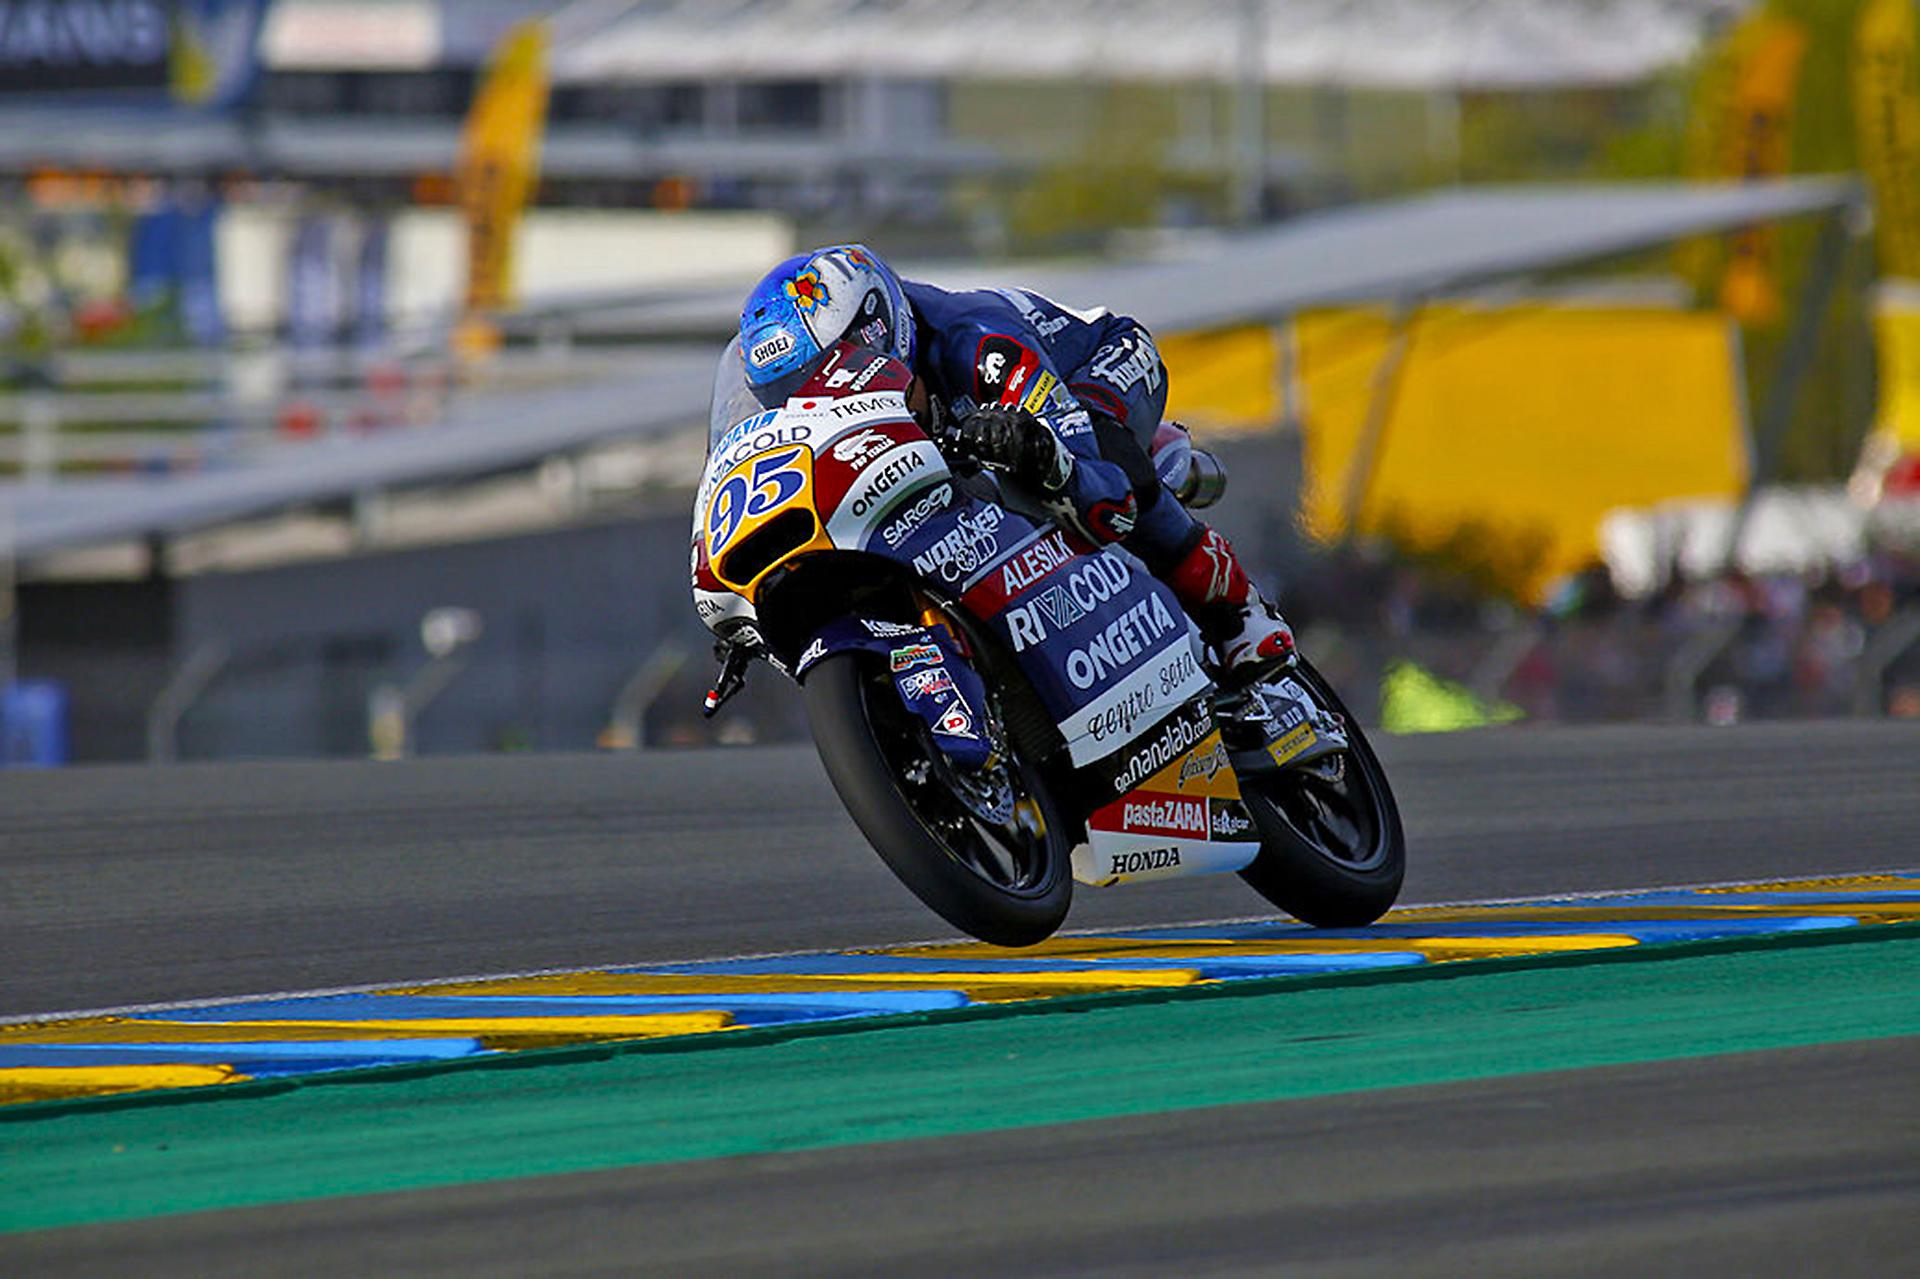 Jules Danilo World Championship Moto3